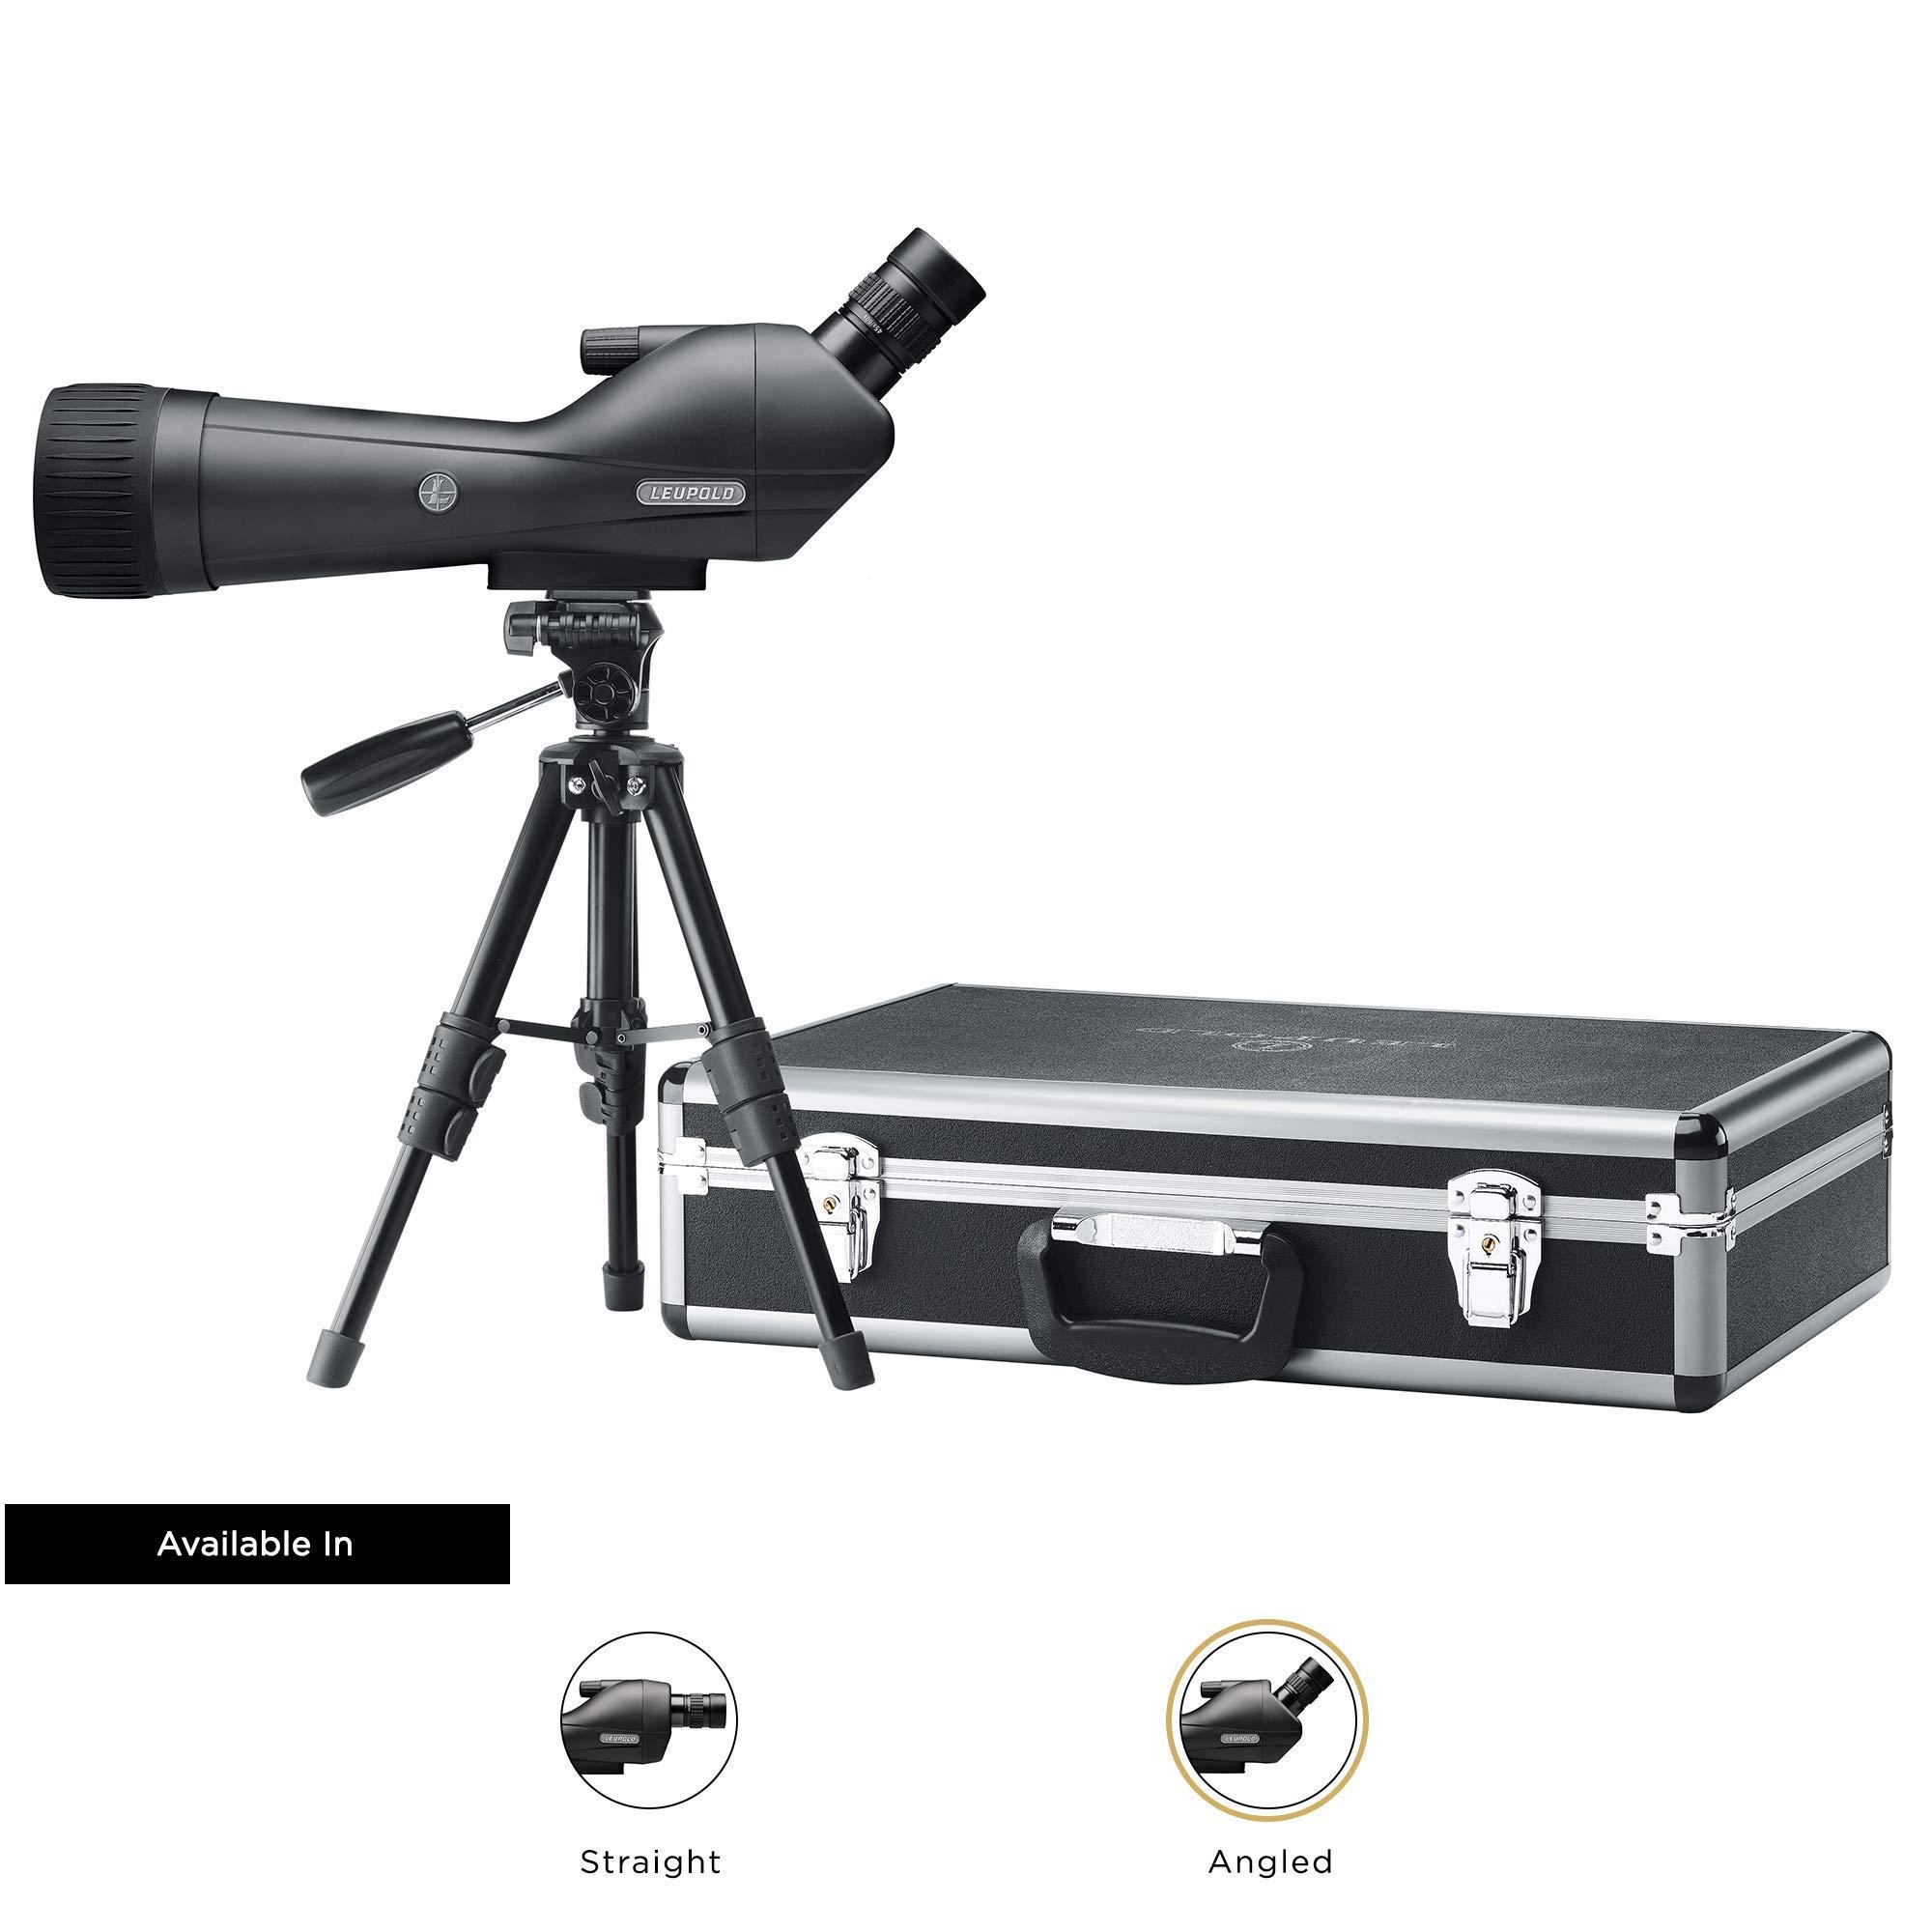 Leupold SX-1 Ventana 2 20-60x80mm Spotting Scope by Leupold